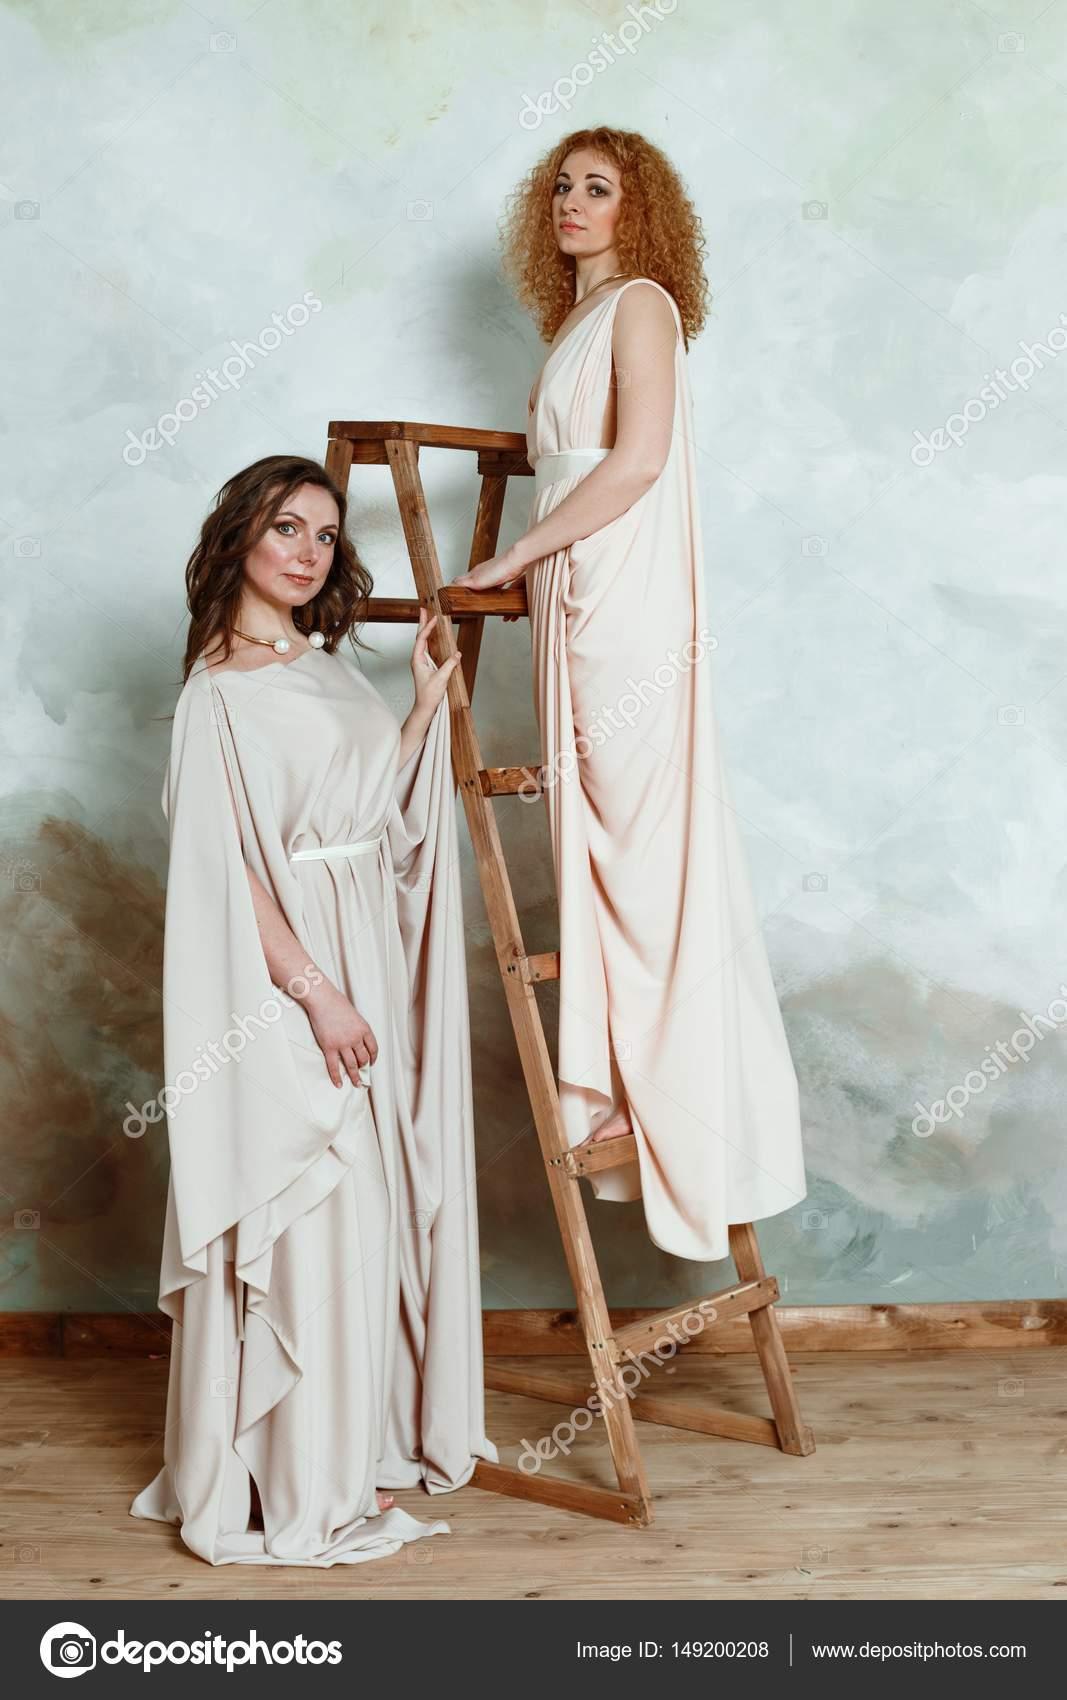 e5cce8d55806 Δύο όμορφες νεαρές γυναίκες ποζάρουν στο κομψό αρχαιοελληνικού τύπου μακριά  φορέματα τοίχος φόντο grunge — Εικόνα από ...